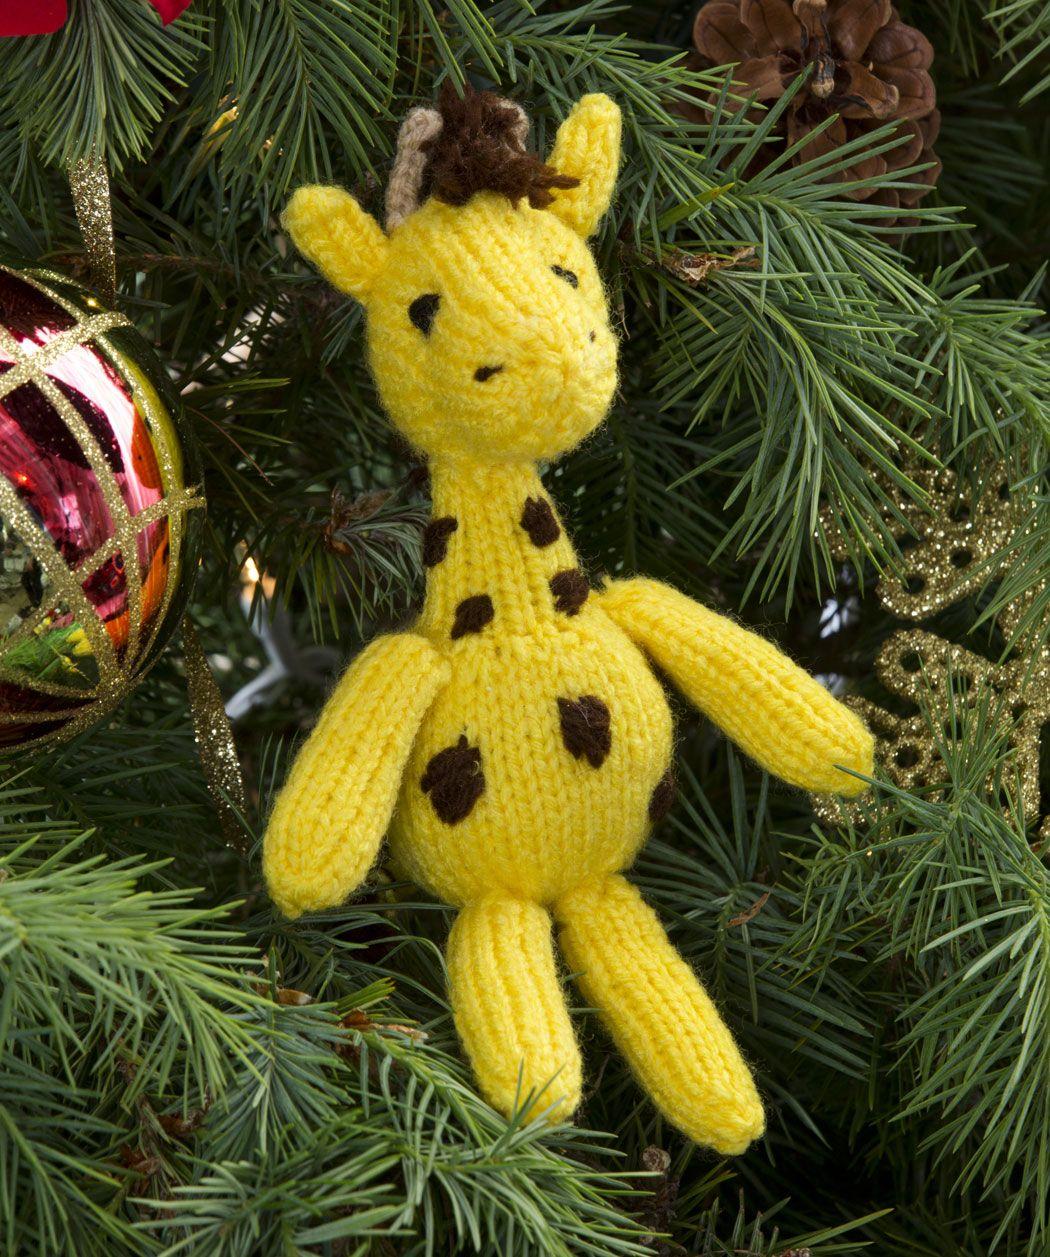 Georgie giraffe ornament knitting pattern knit diy gifts georgie giraffe ornament knitting pattern knit bankloansurffo Choice Image